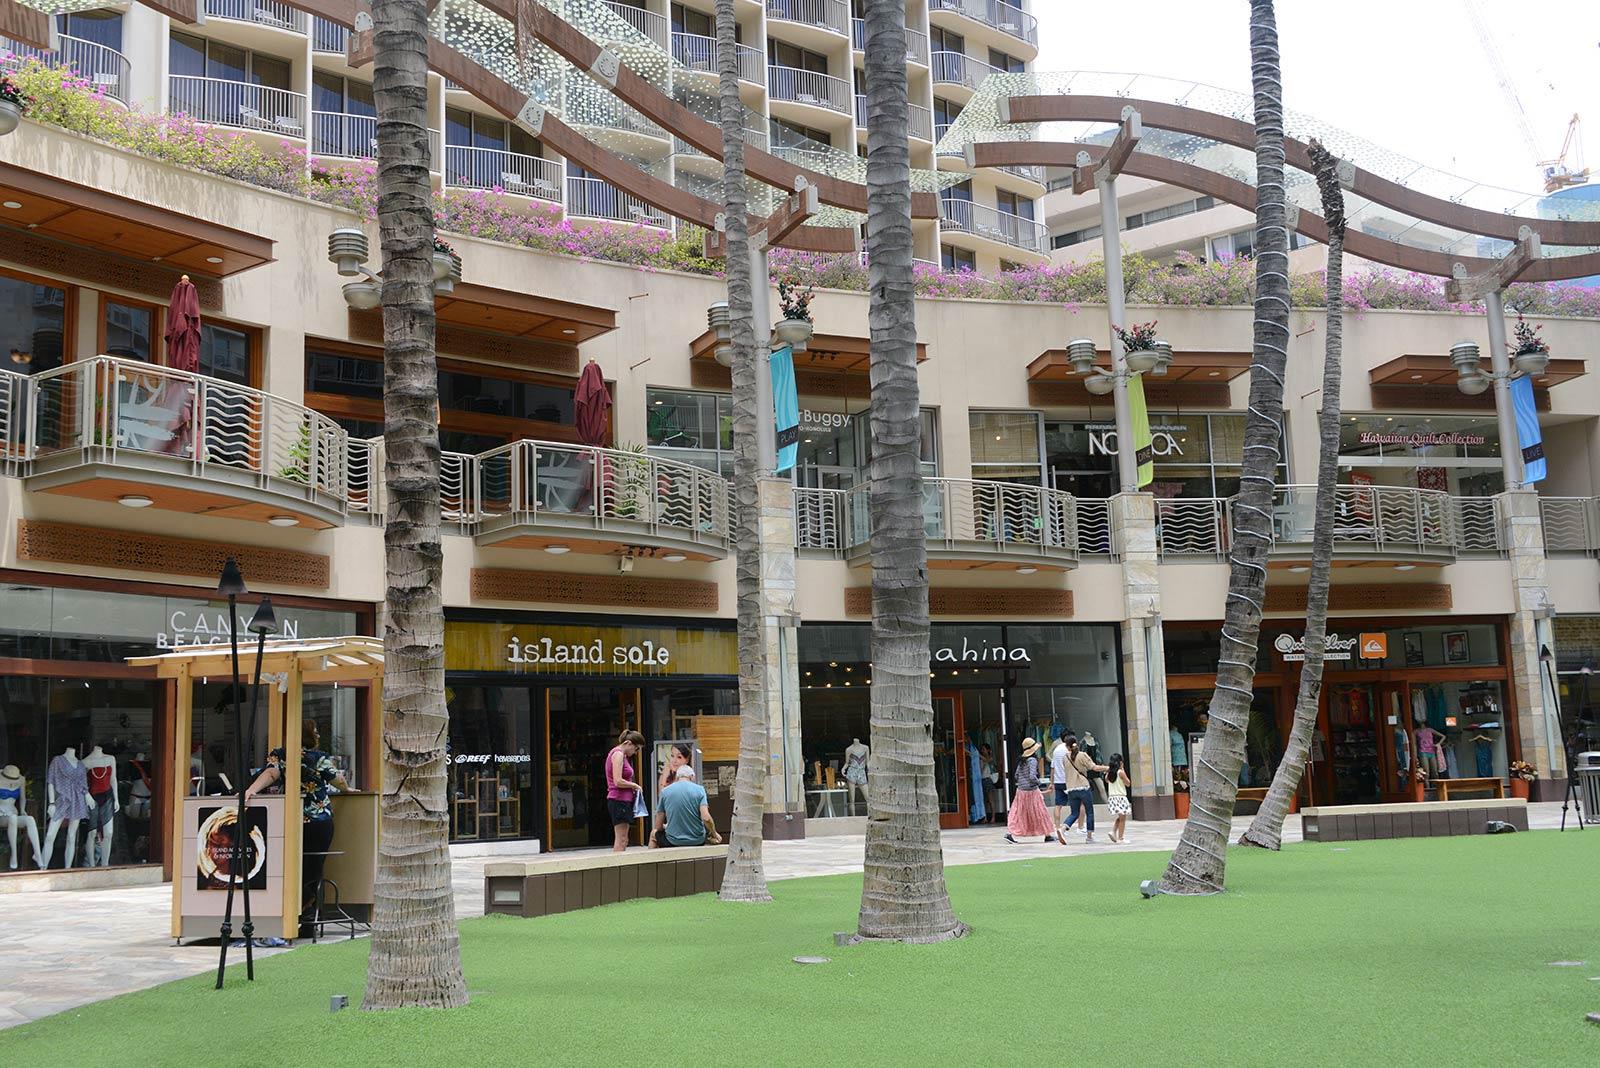 Hilton Hokulani Waikiki timeshare resales